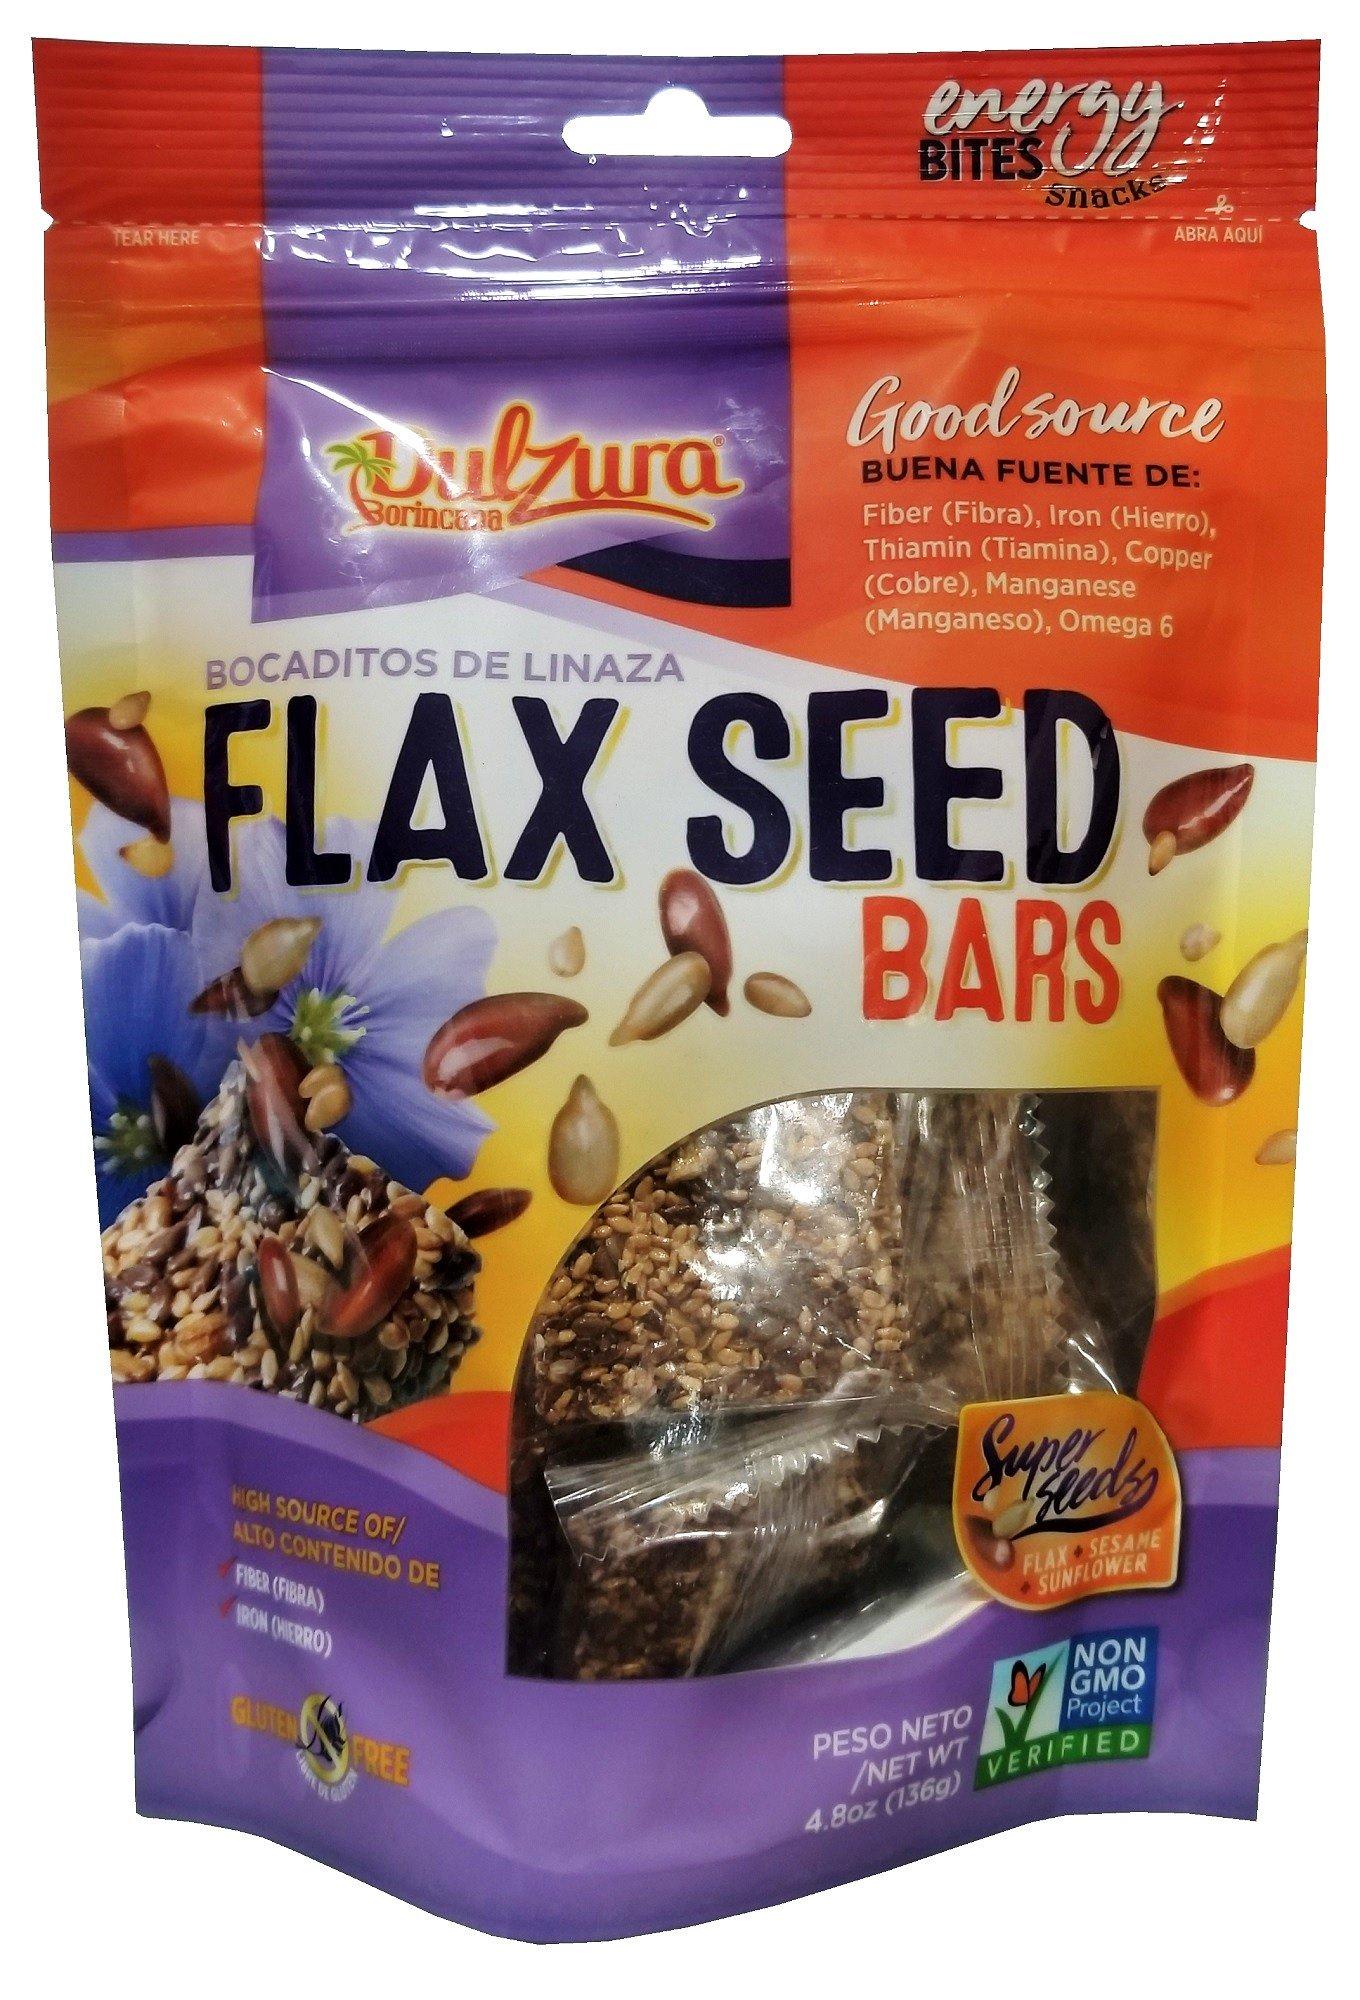 Dulzura Borincana Nutri Seeds (Flax Seeds, Seame Seeds, Sunflower Seeds) Bites 5